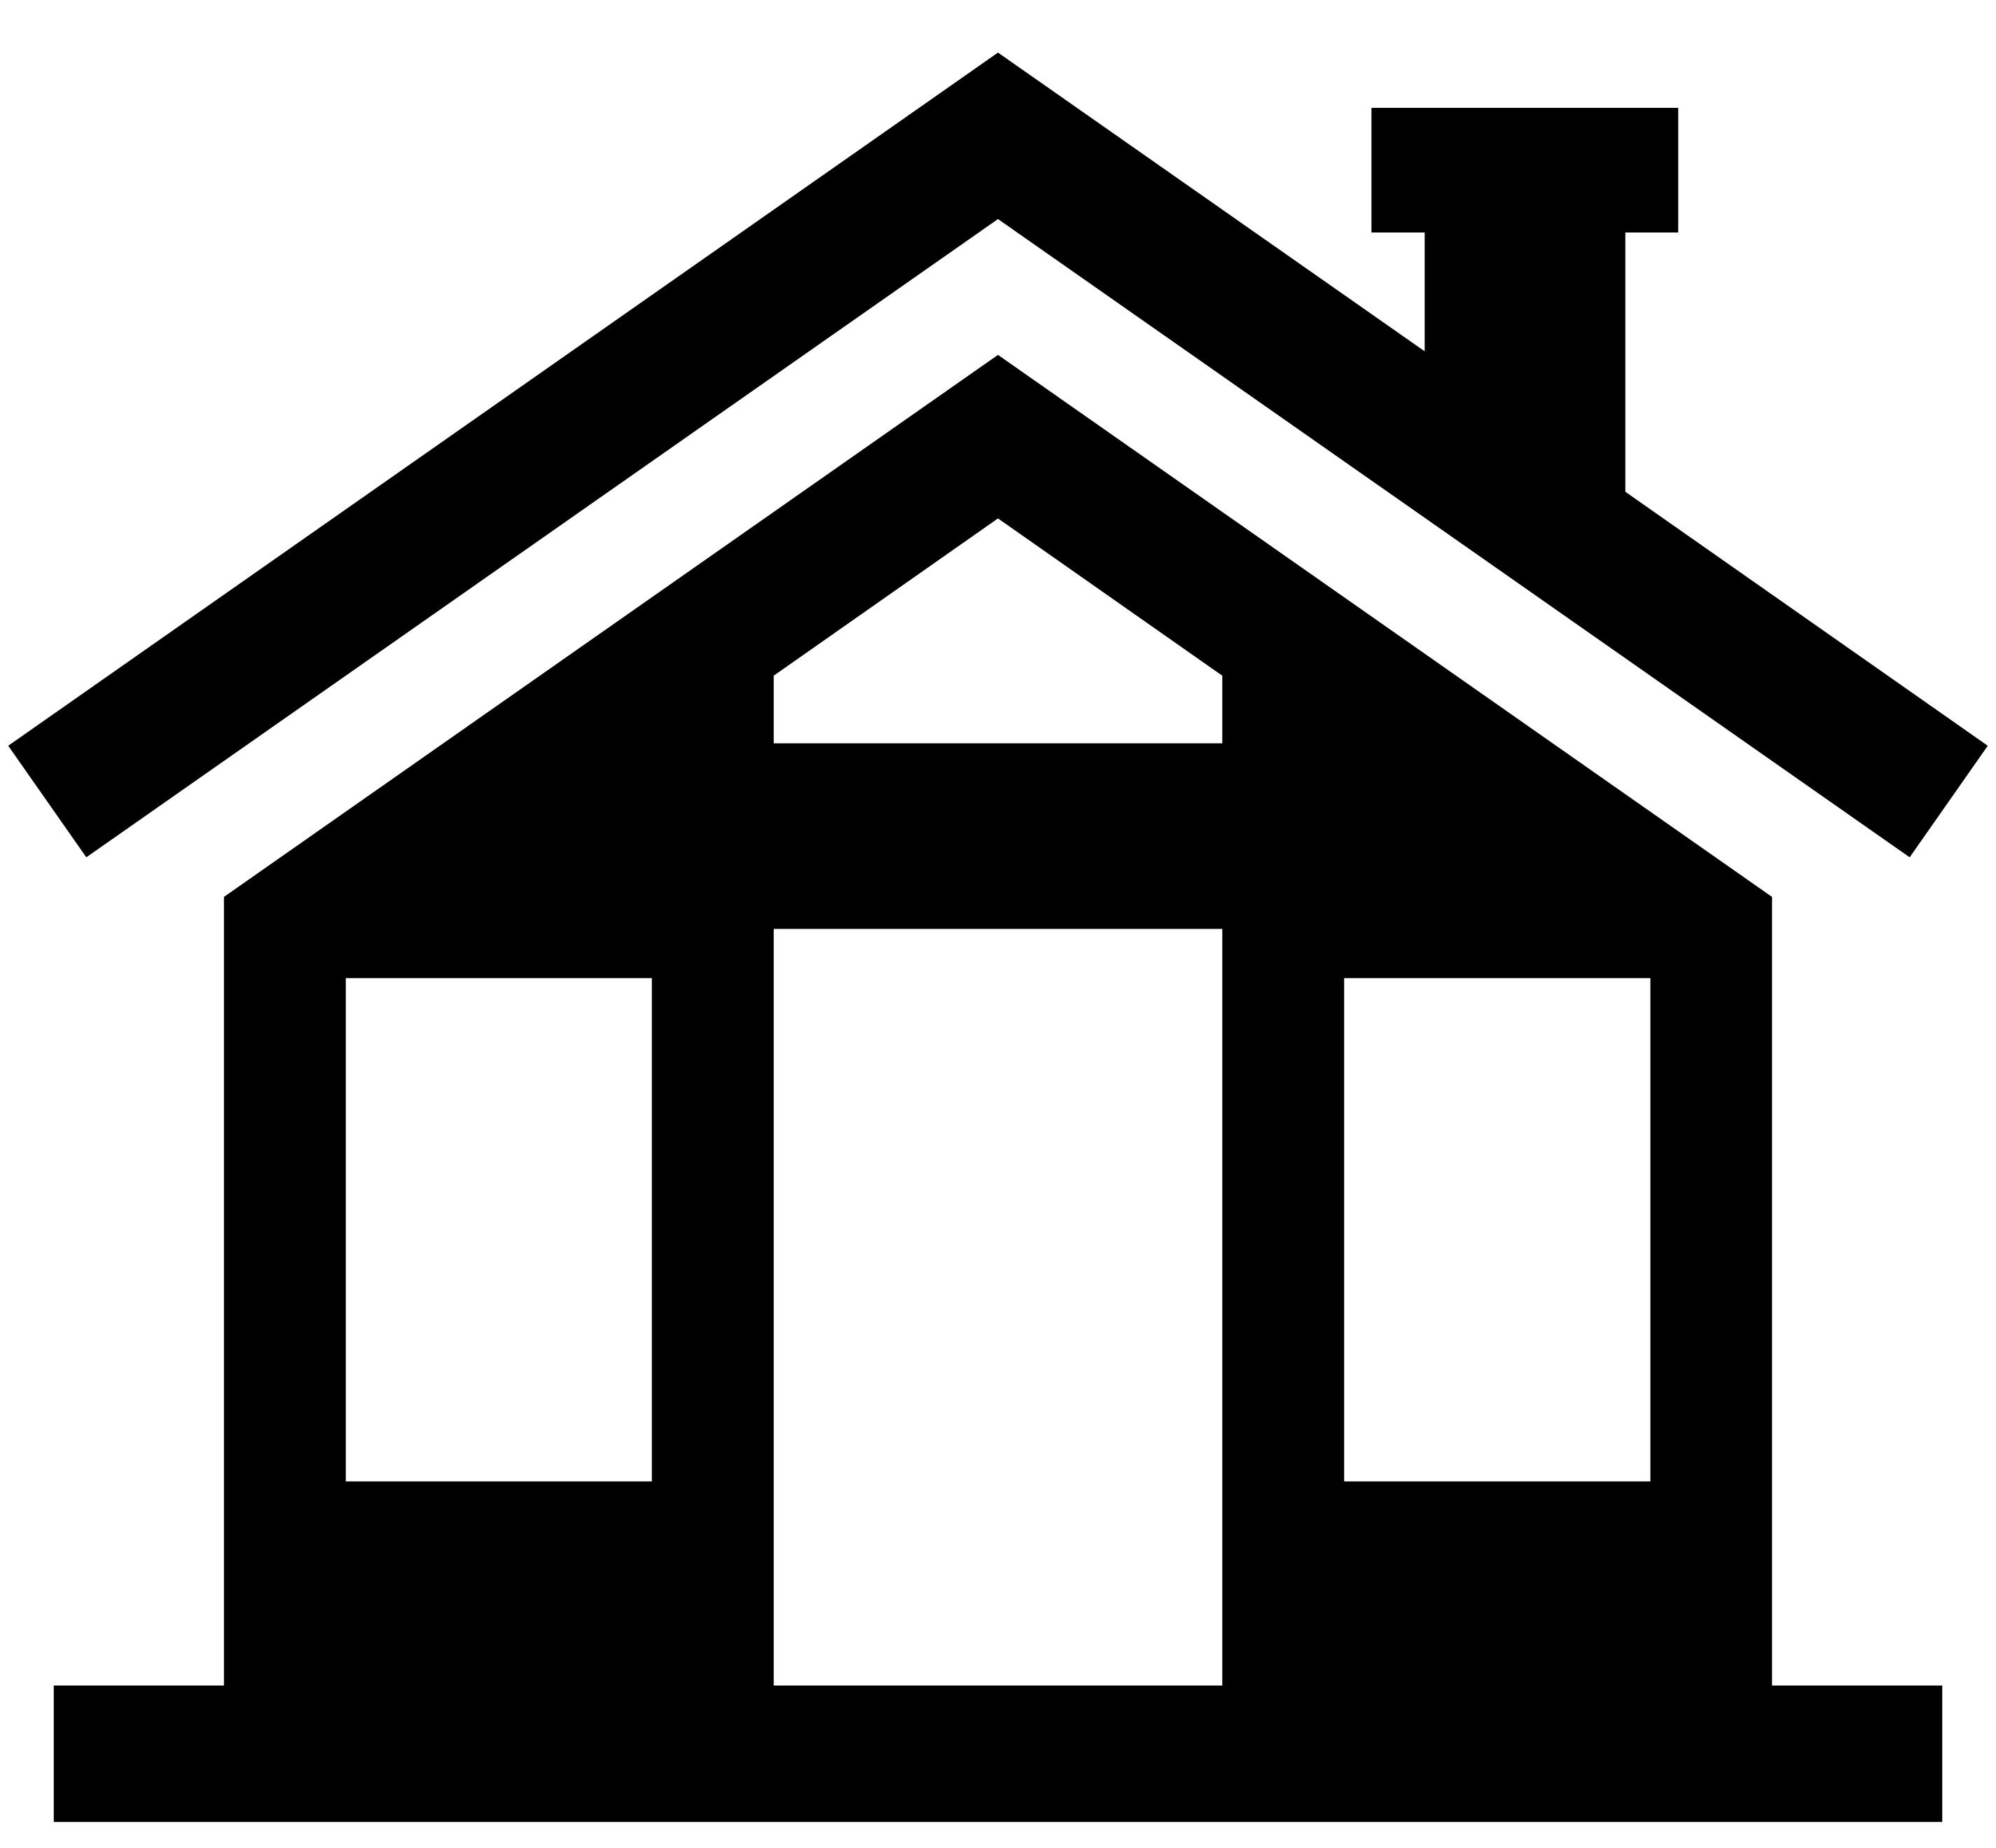 2850x2639 Places Clipart Simple House